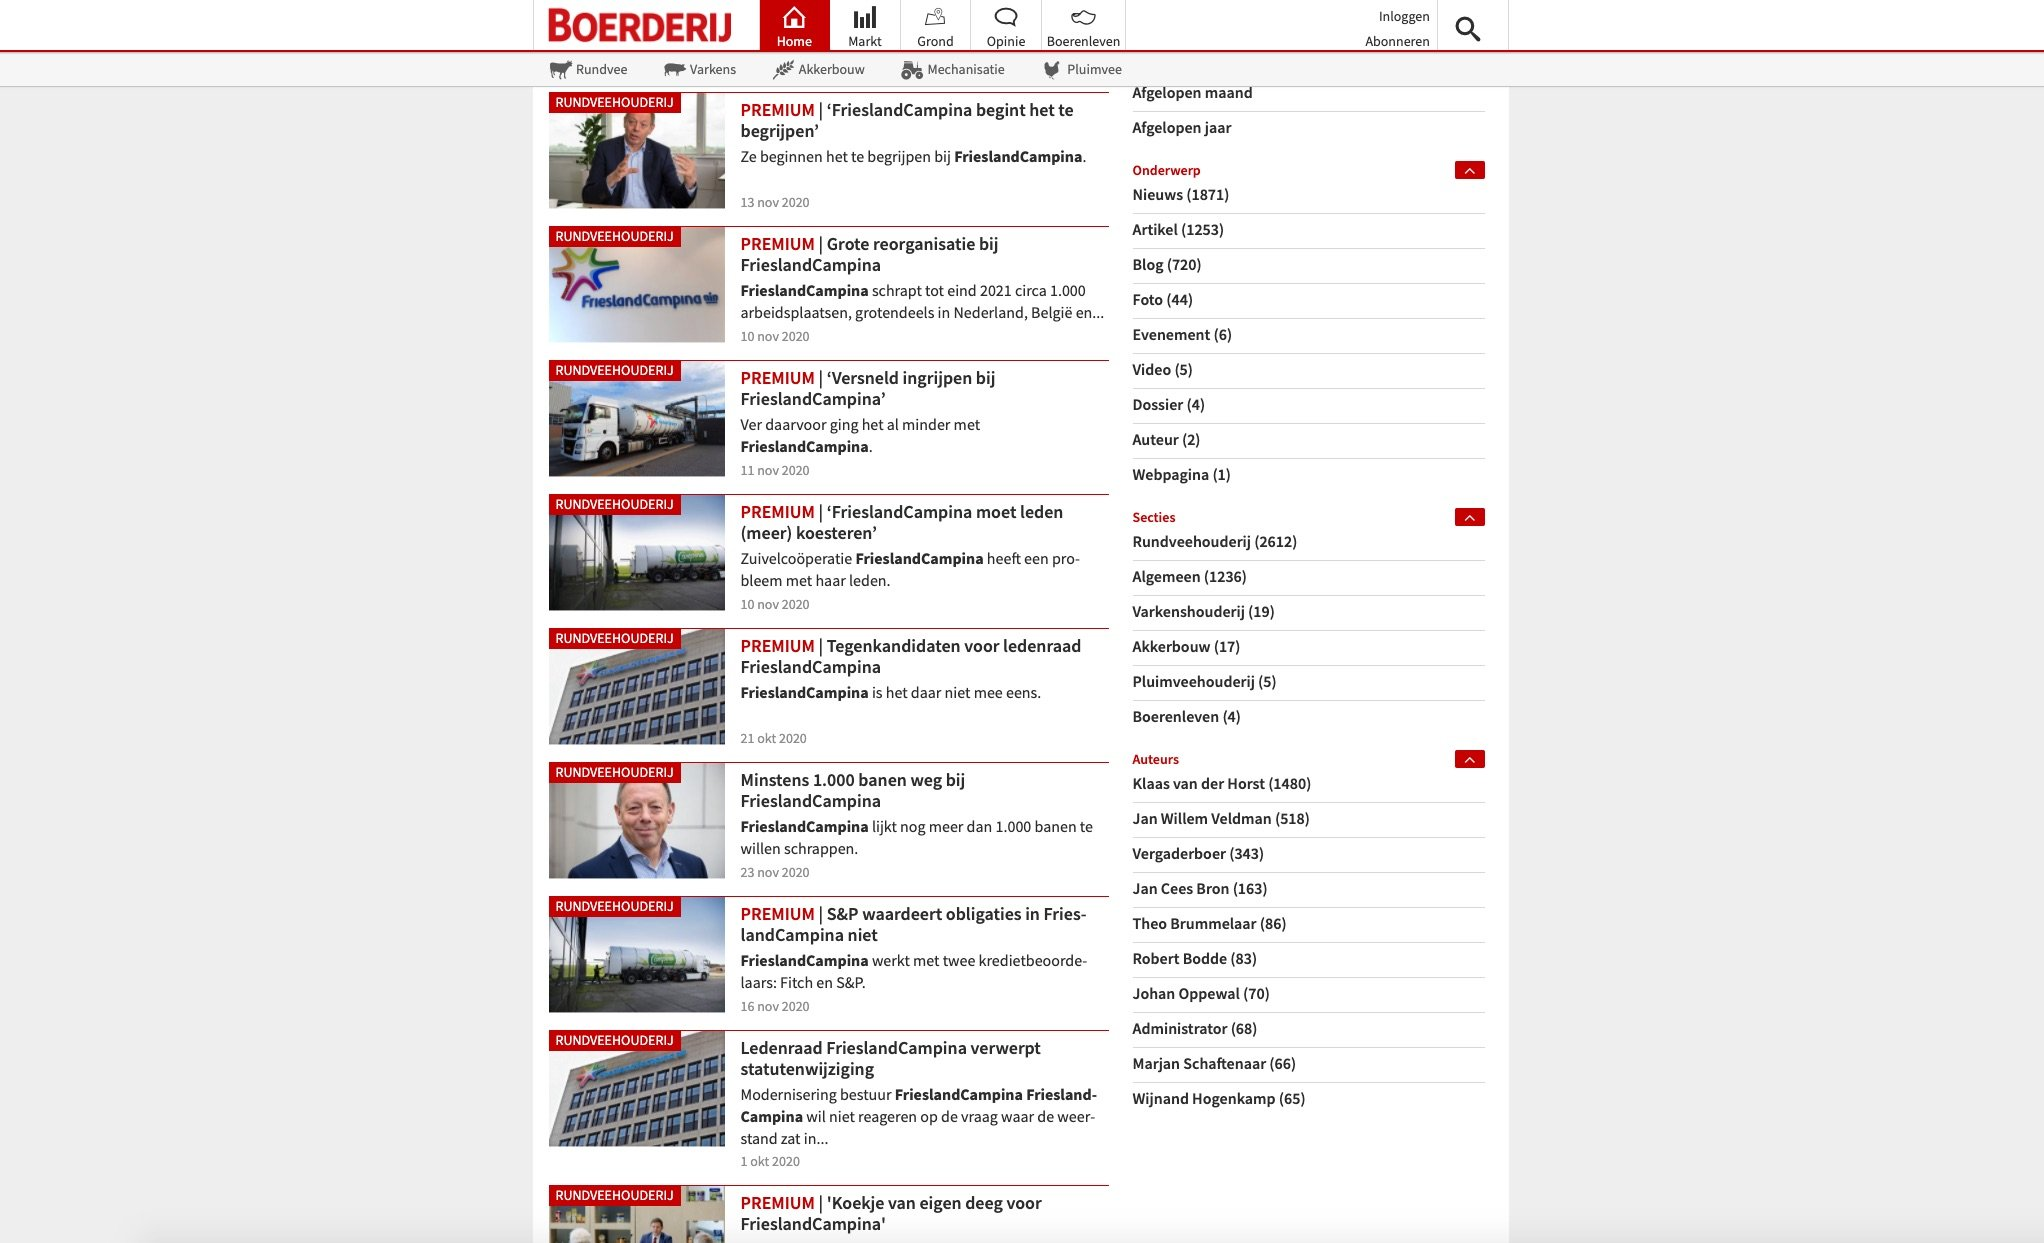 Graphit-Boerderij-workflow-for-content-creation-4